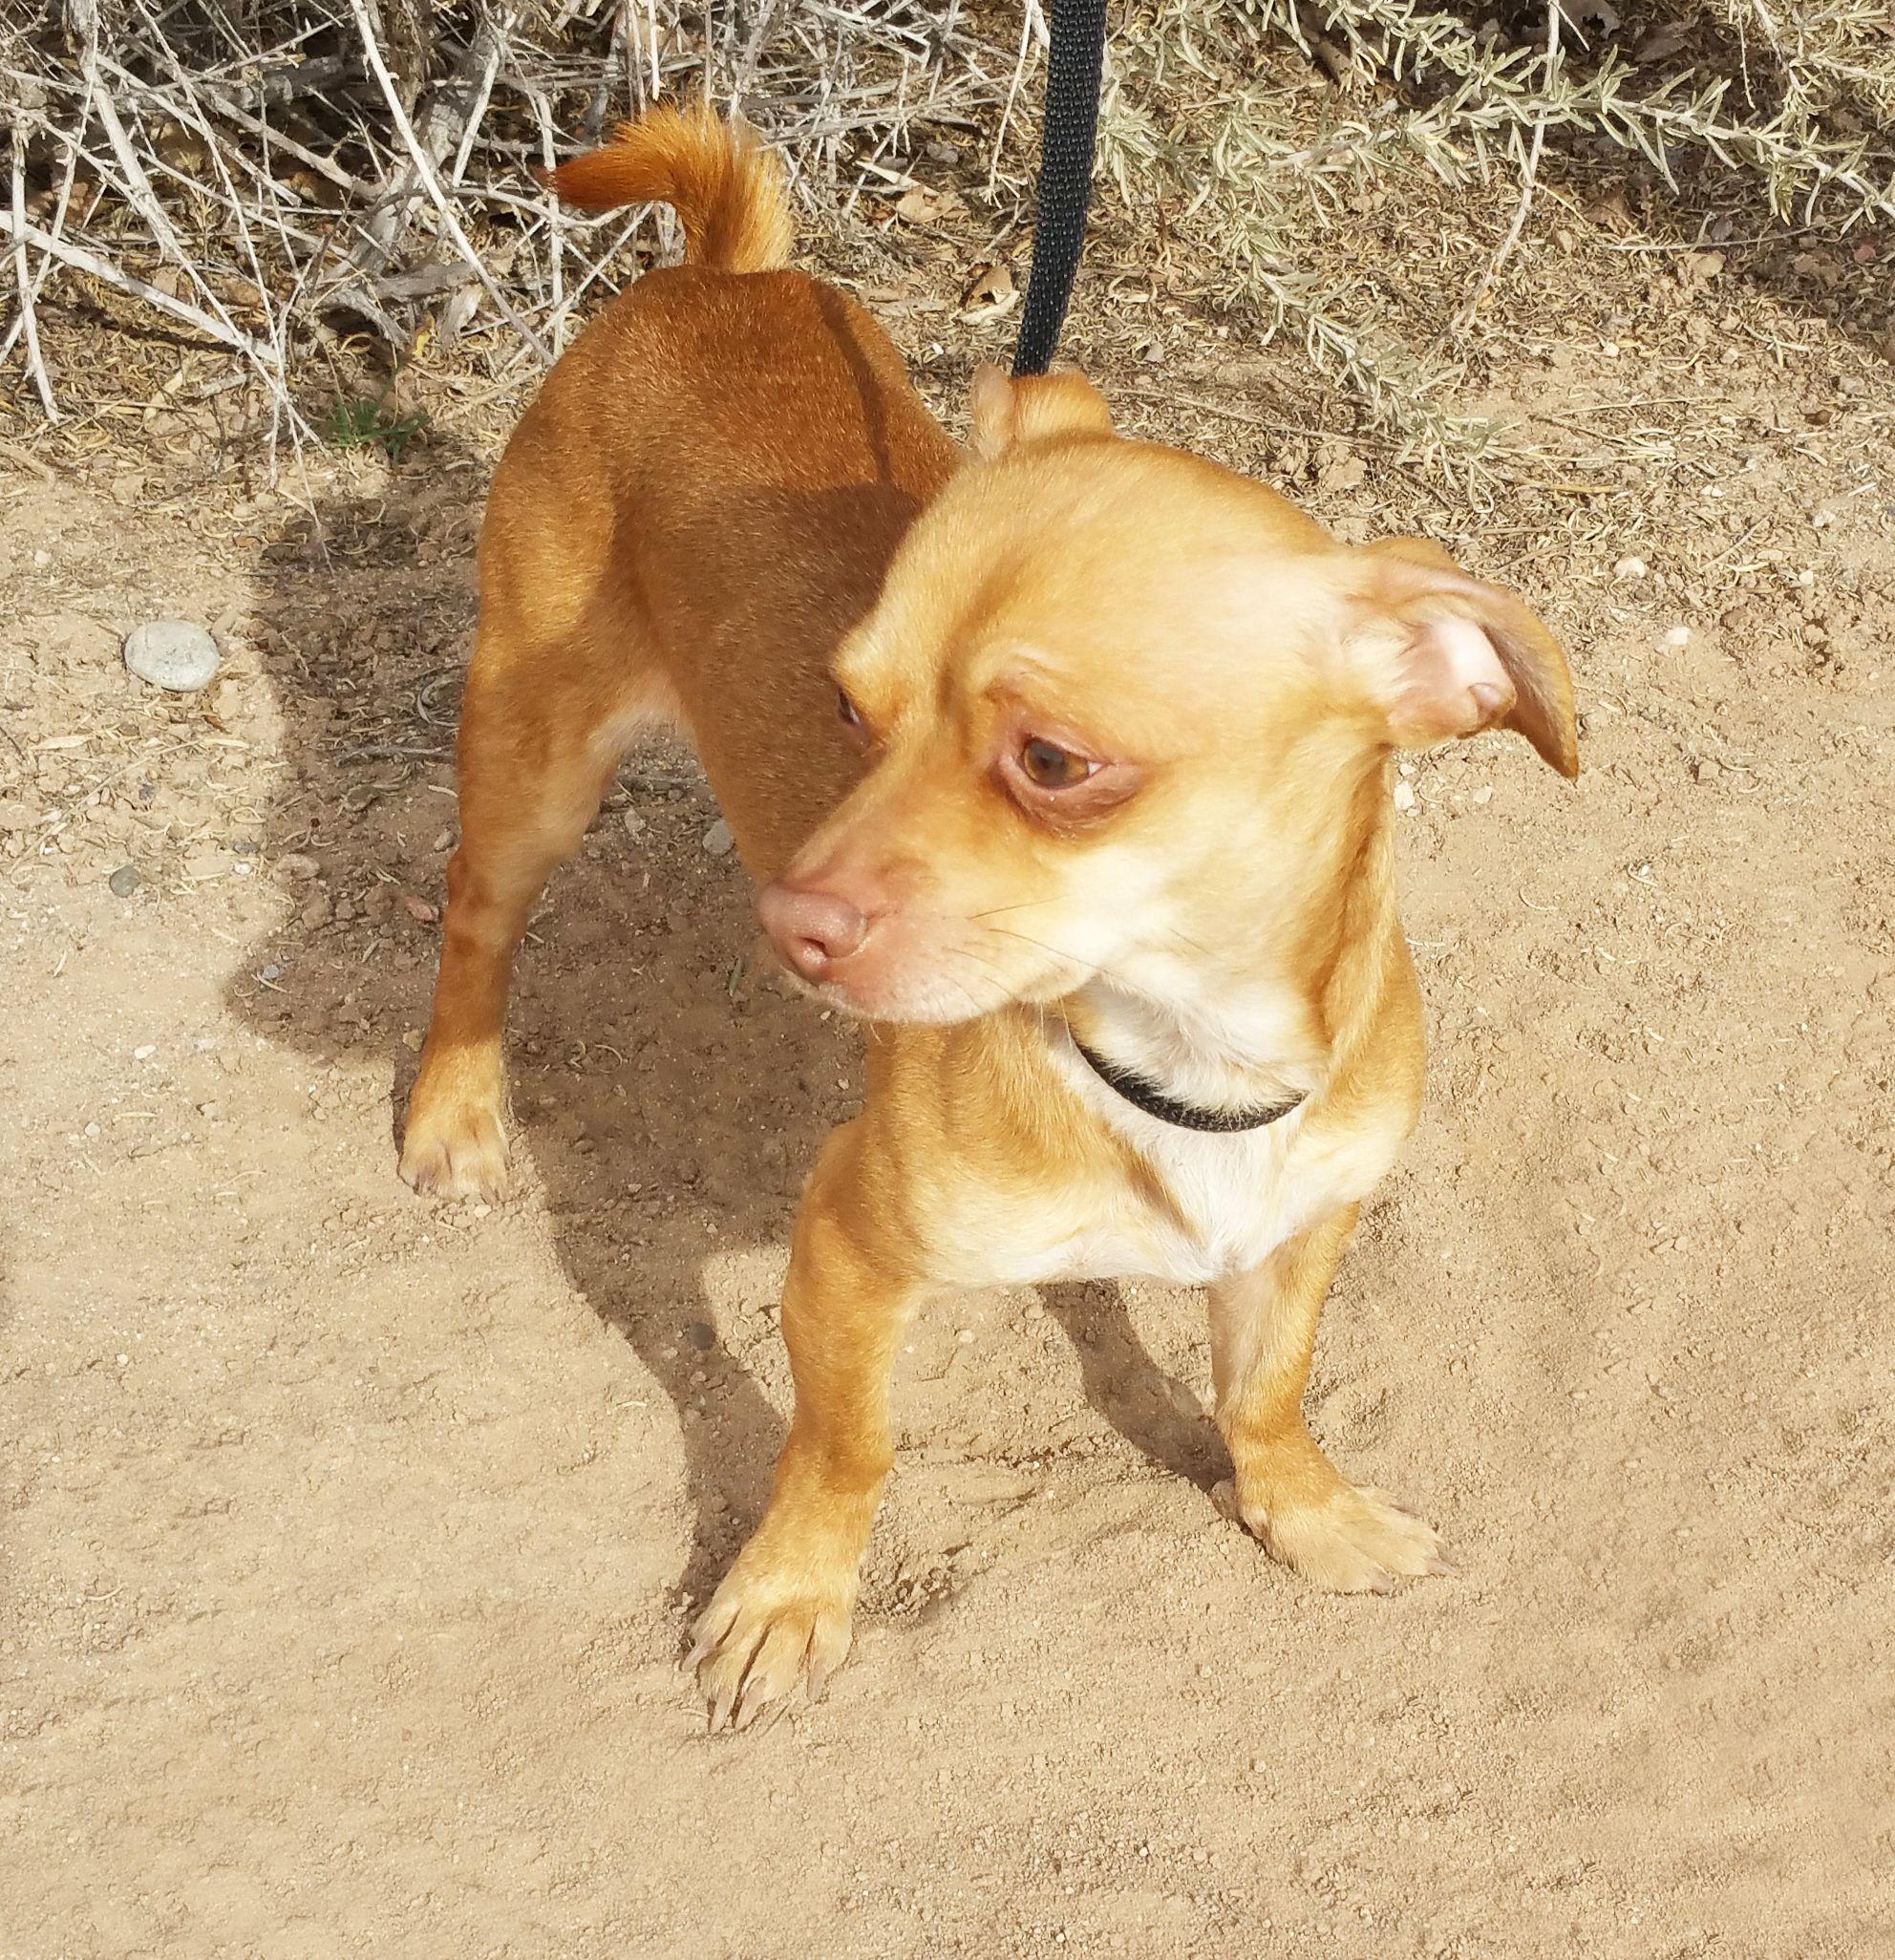 Dachshund Dog For Adoption In Albuquerque Nm Adn 474642 On